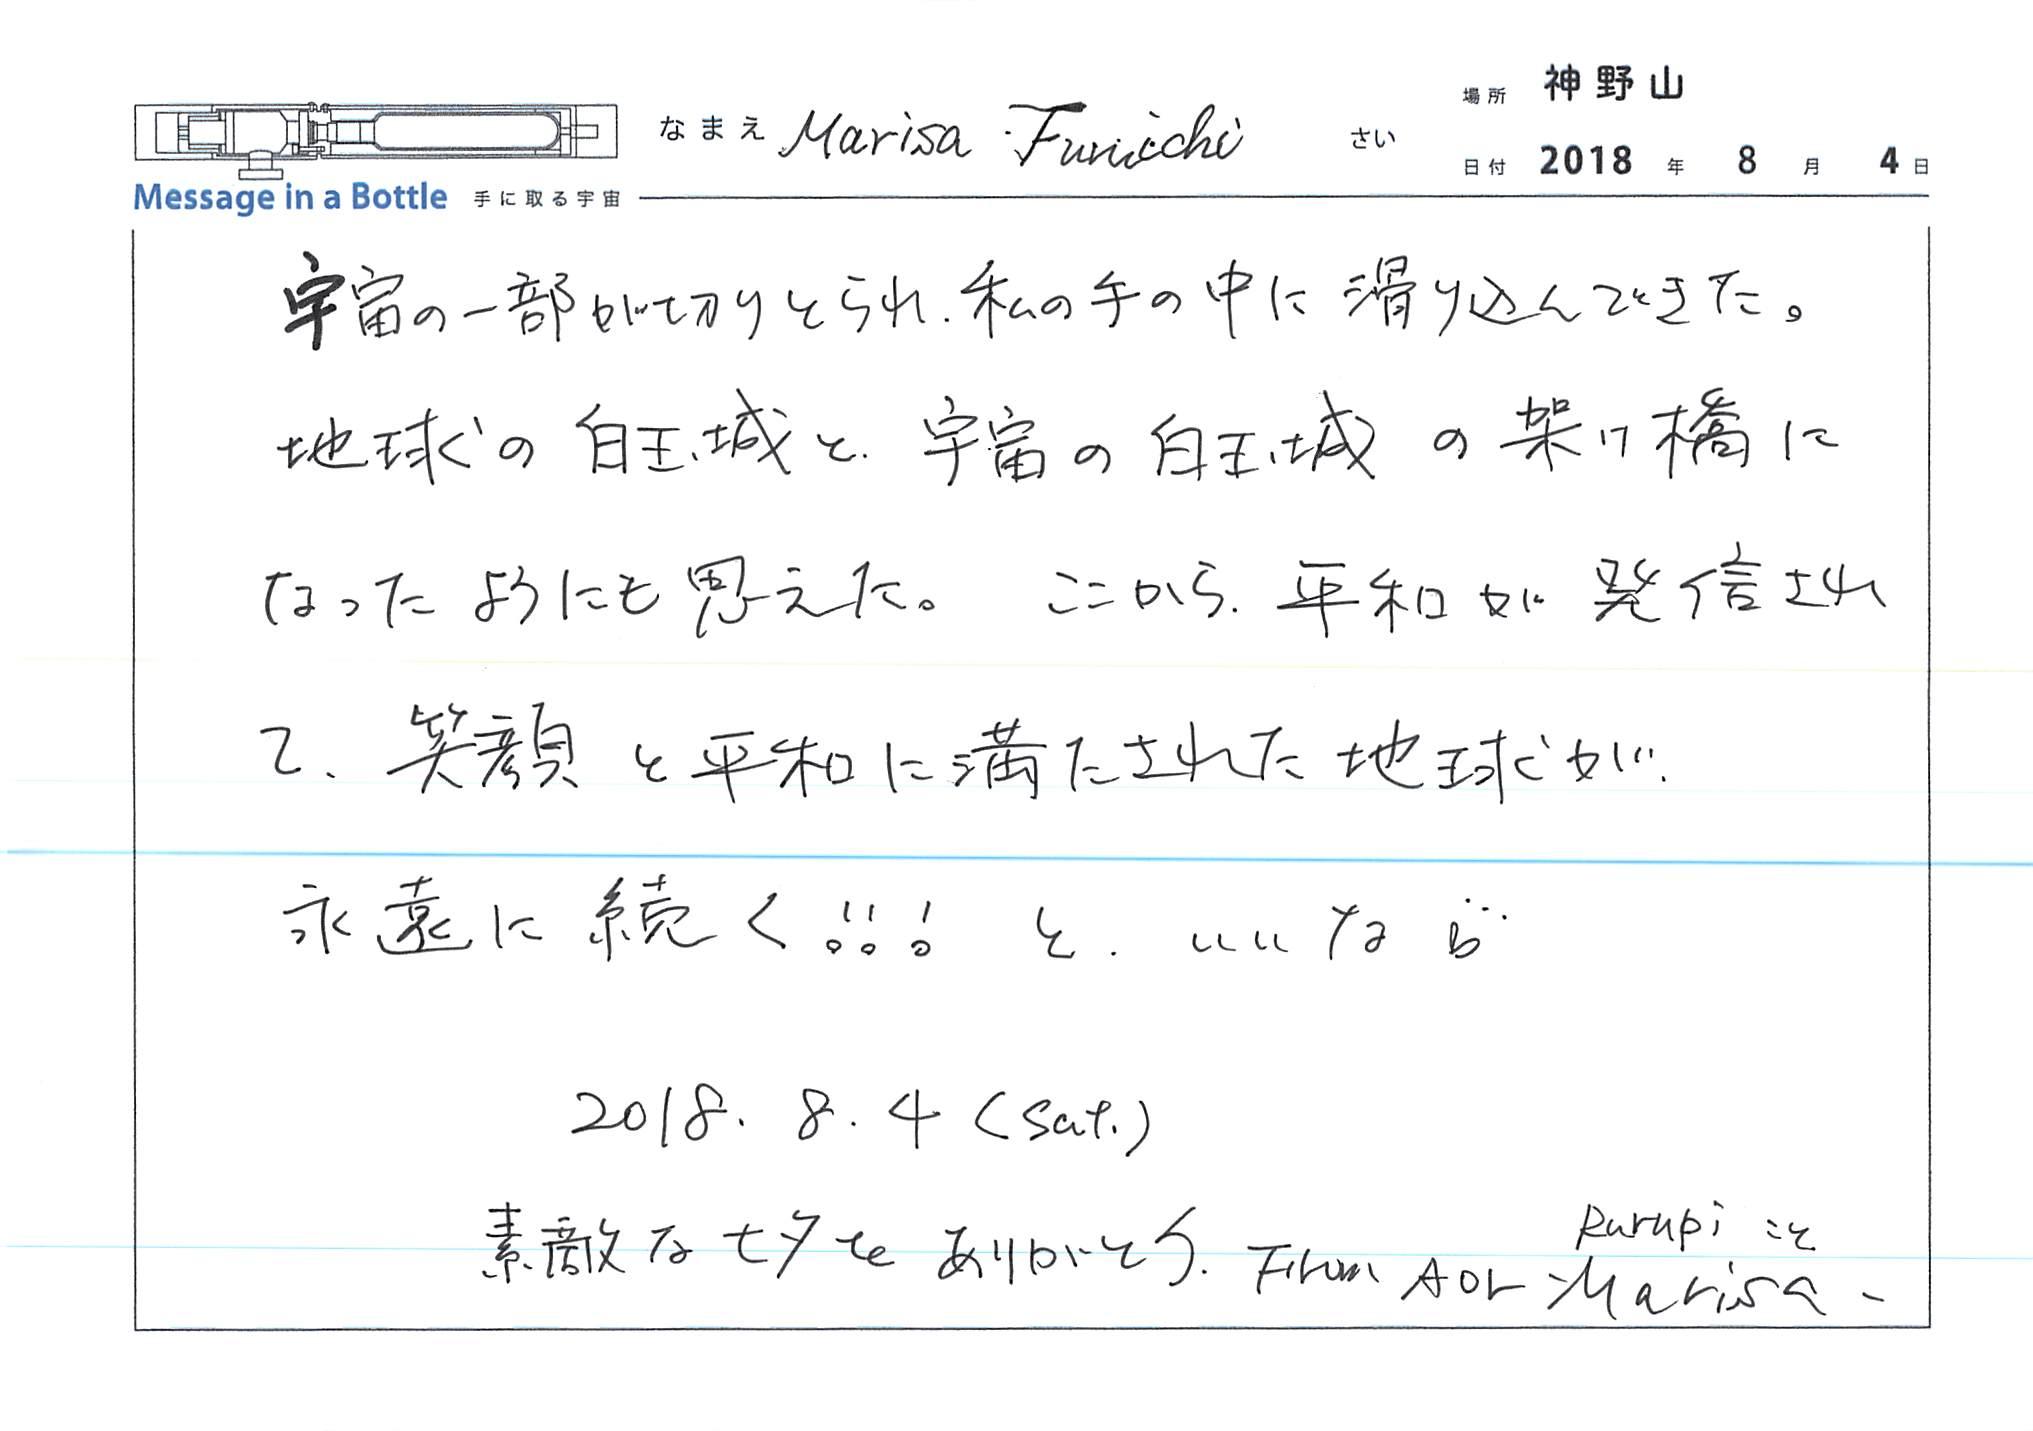 2018-08-04-19-48-41